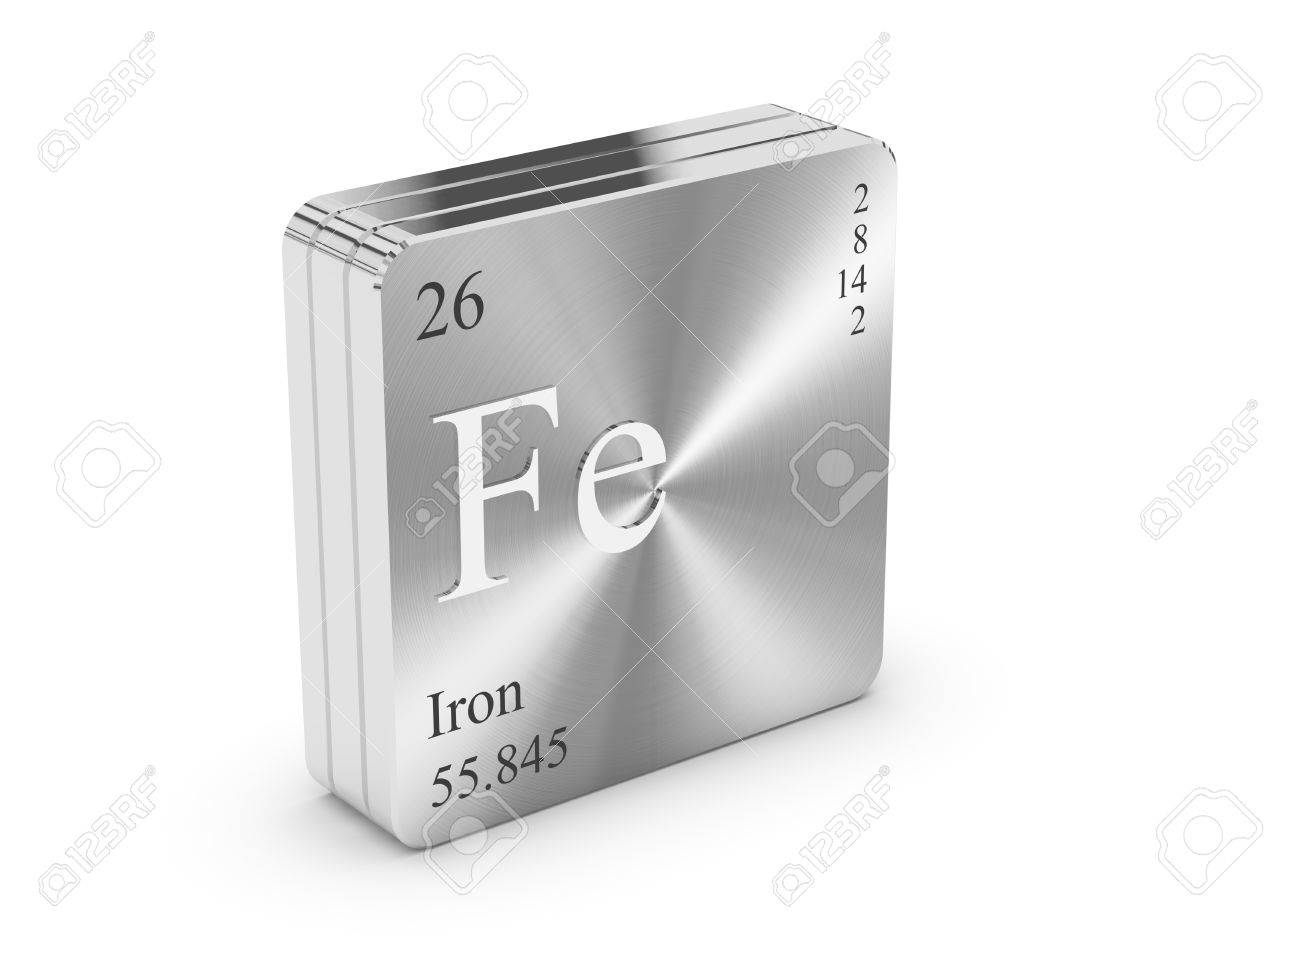 26th element periodic table images periodic table images 26th element periodic table images periodic table images 26th element periodic table choice image periodic table gamestrikefo Image collections